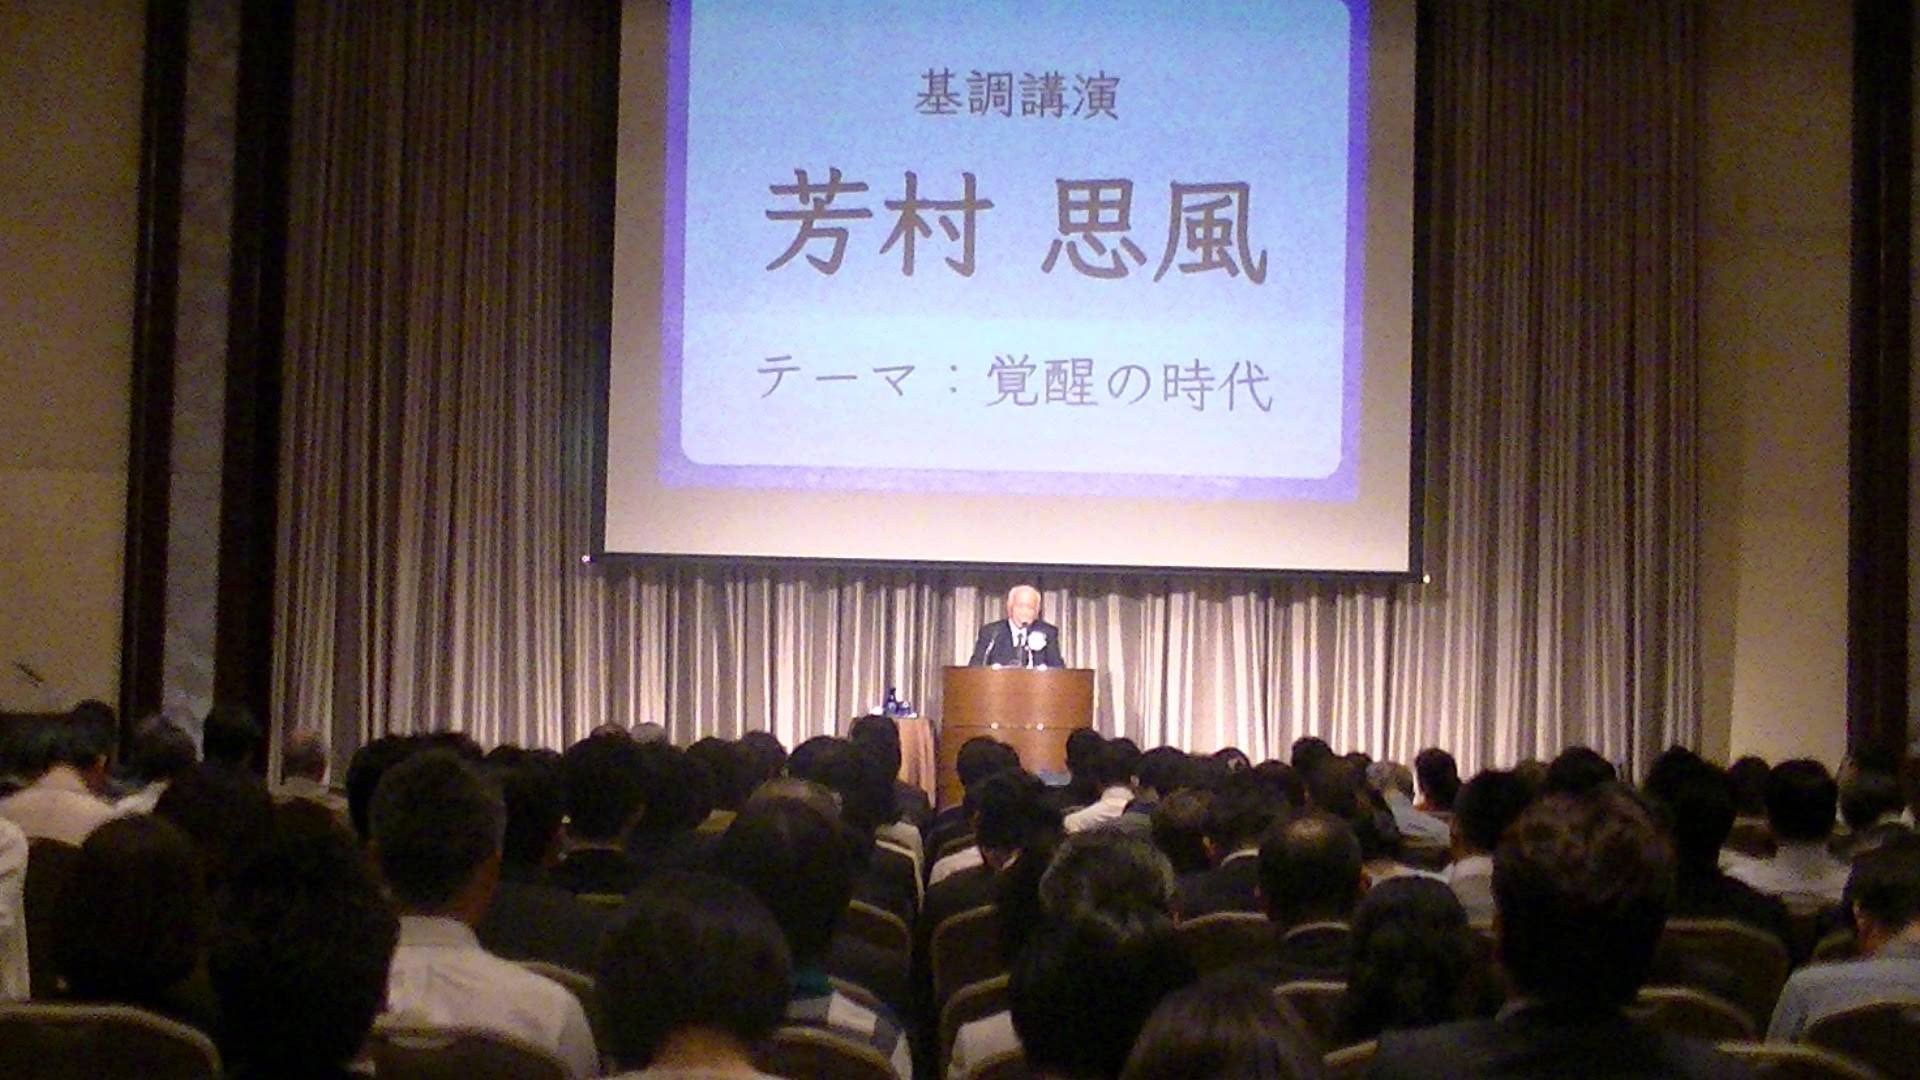 PIC 1683 1 - 思風会全国大会in広島